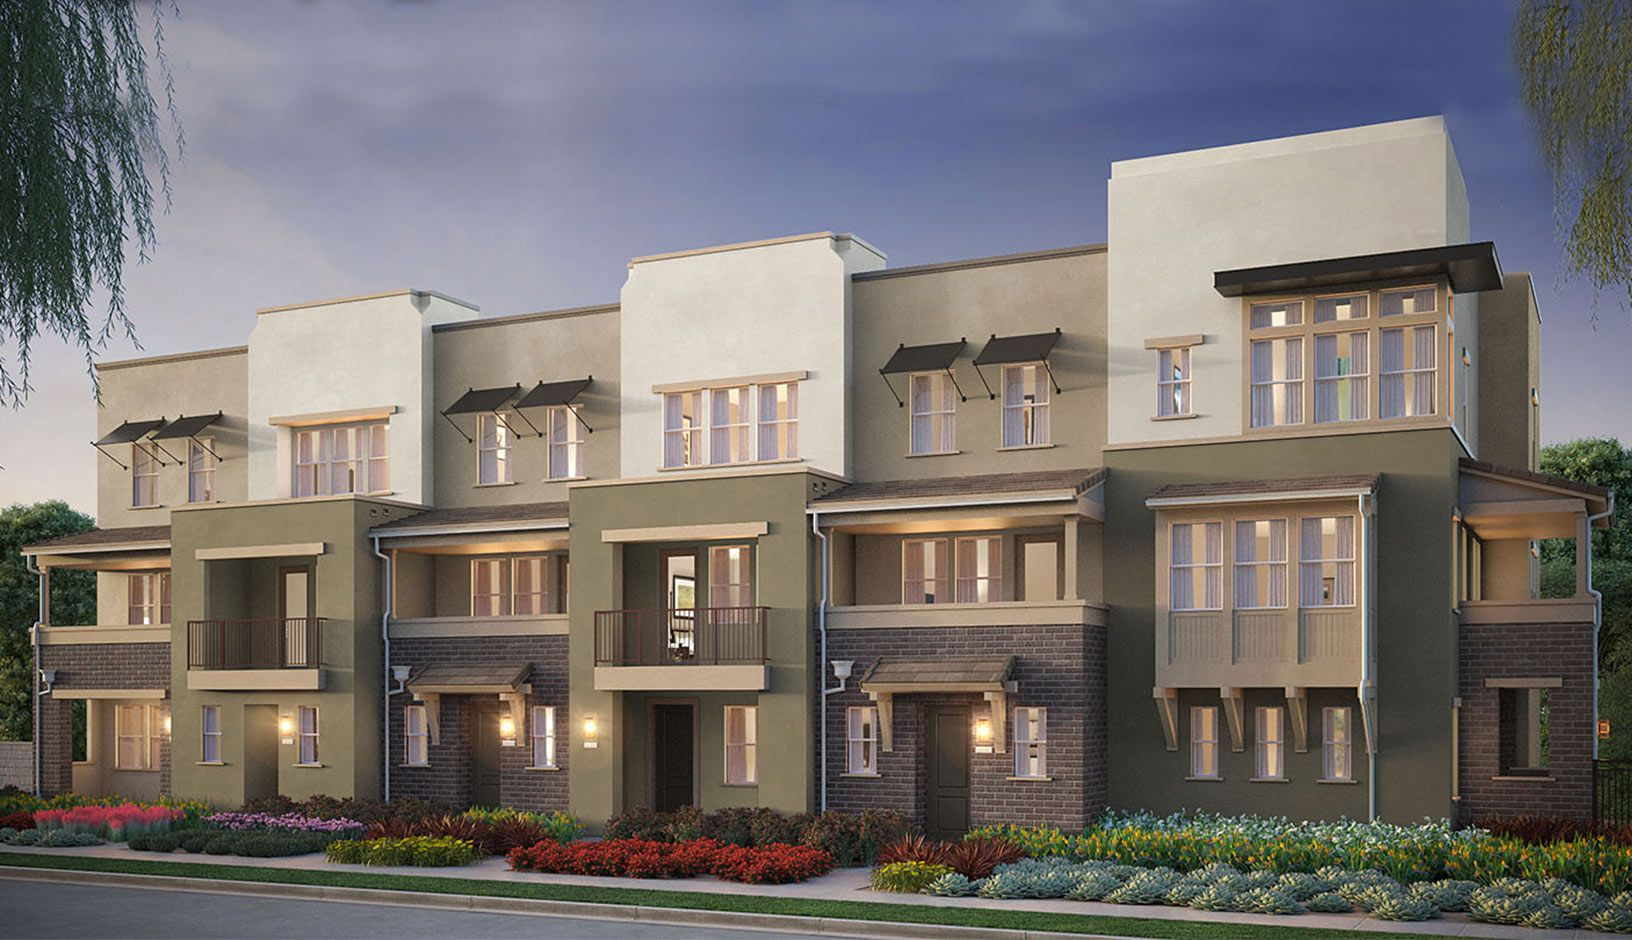 Unifamiliar por un Venta en Residence 1 5881 Rostrata Avenue Buena Park, California 90620 United States